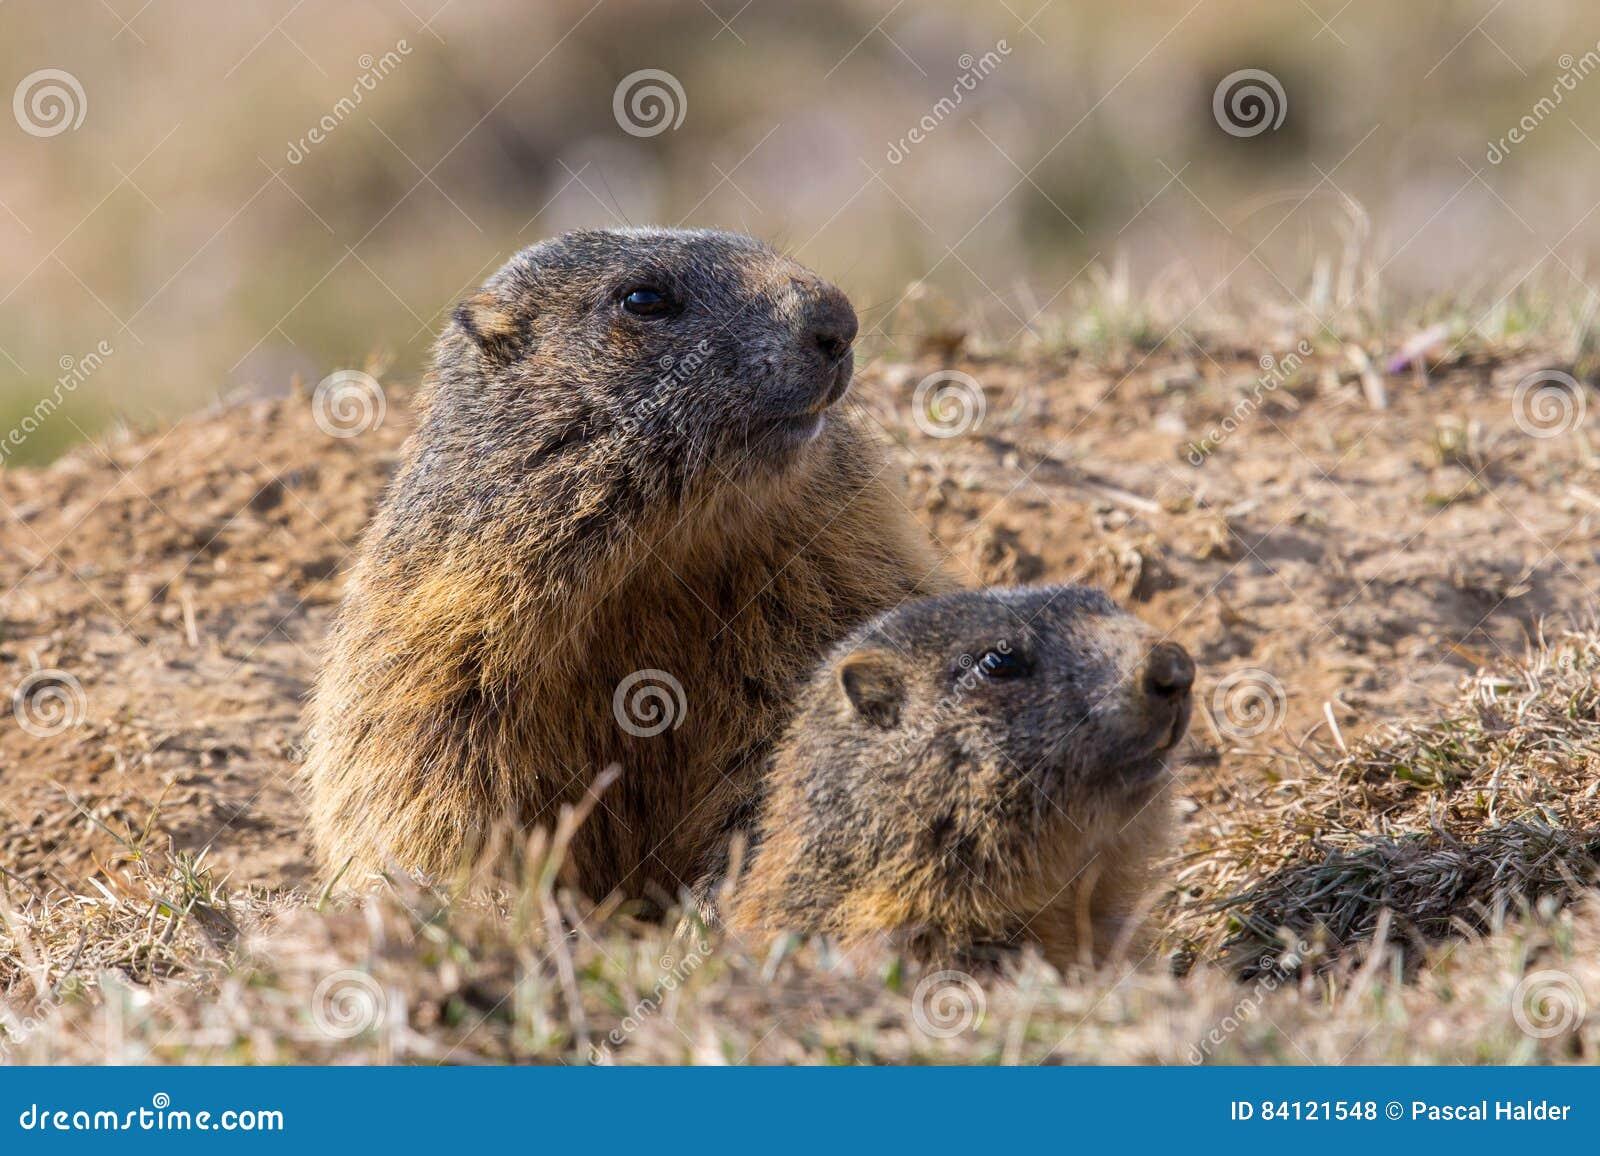 Two sitting groundhogs Marmota monax